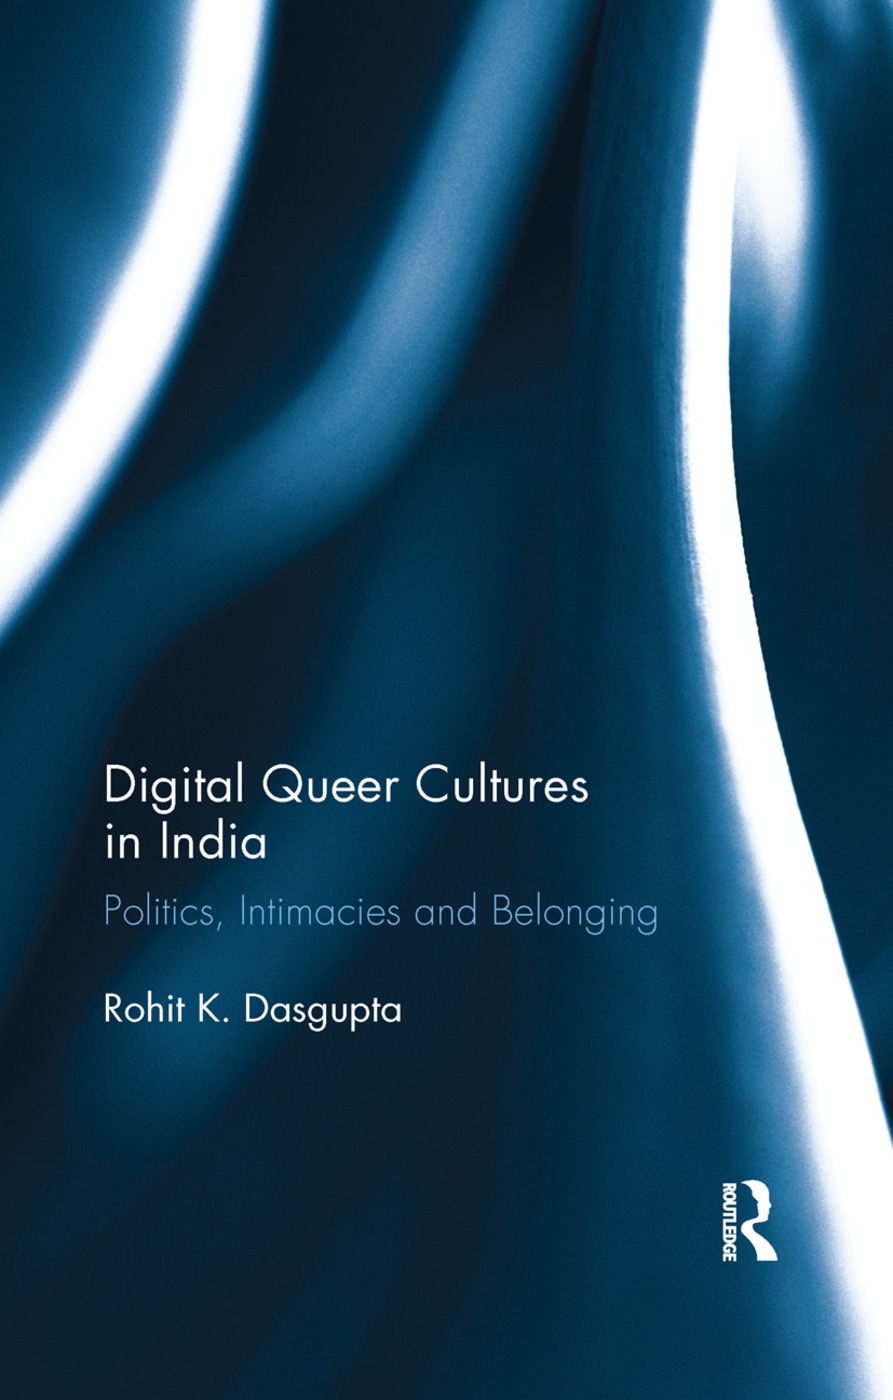 Digital Queer Cultures in India: Politics, Intimacies and Belonging book cover